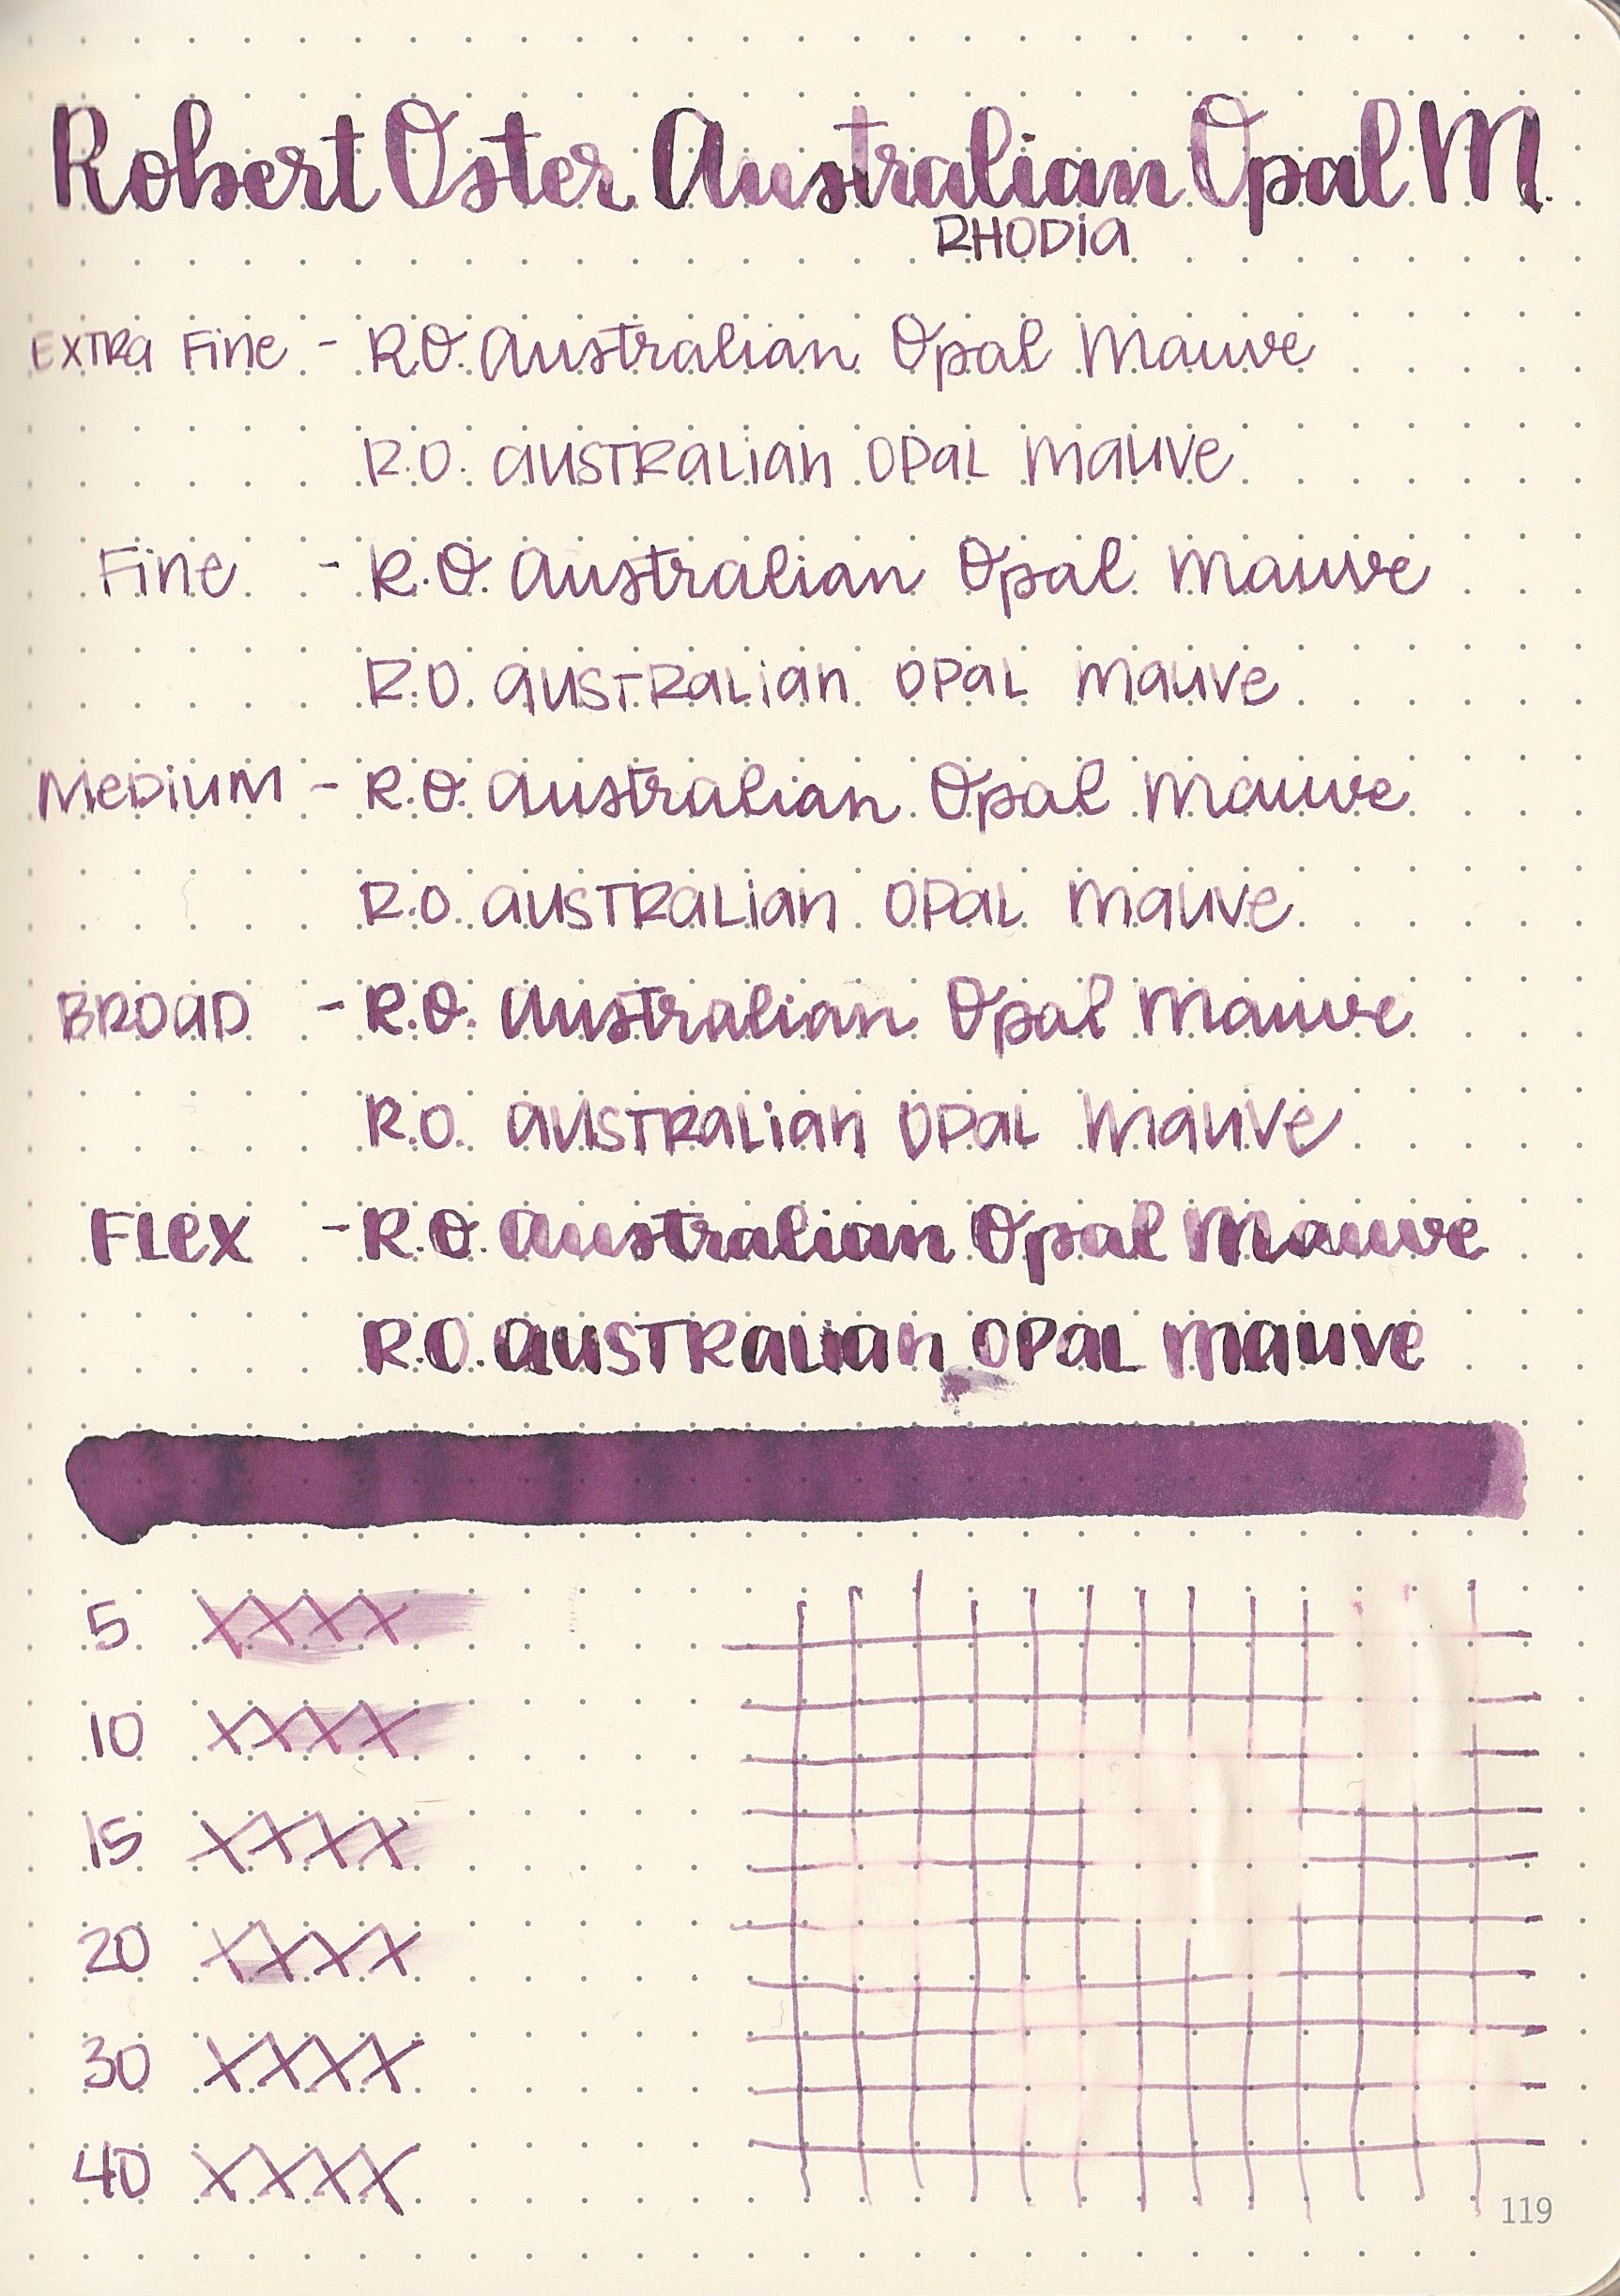 ROAustralianOpalMauve - 6.jpg